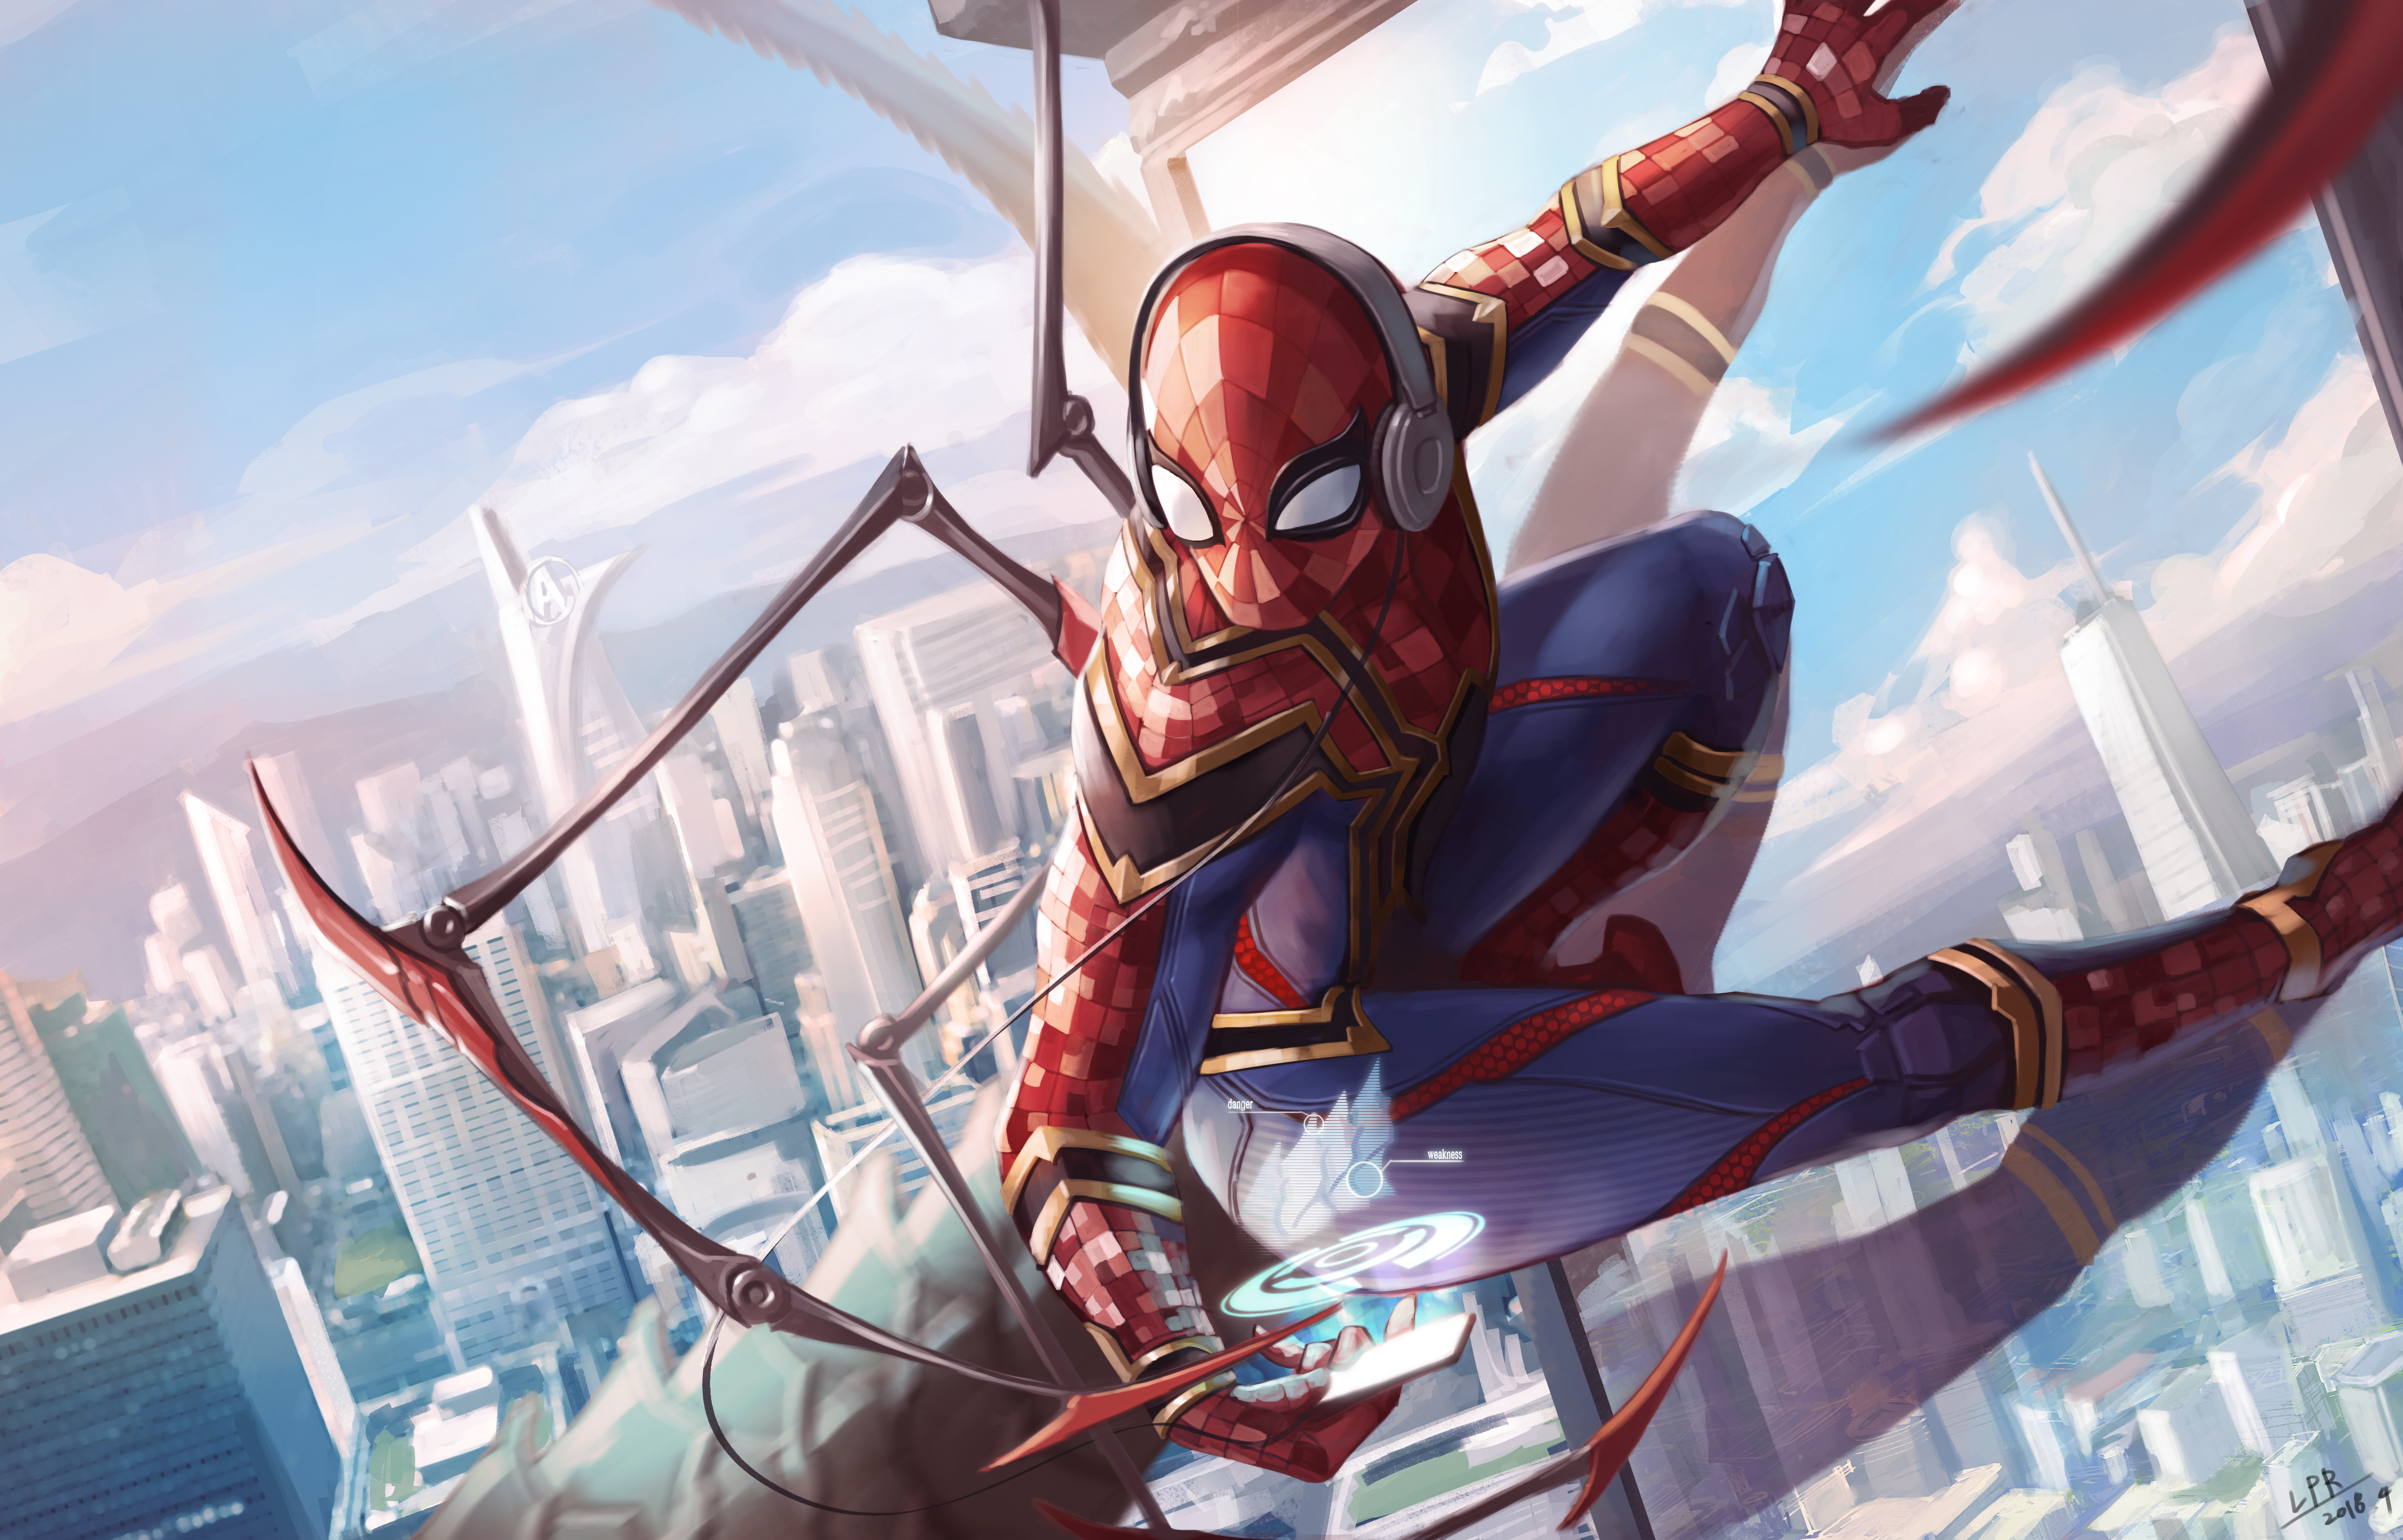 1360x768 spiderman iron suit art 5k laptop hd hd 4k - Iron man spiderman wallpaper ...